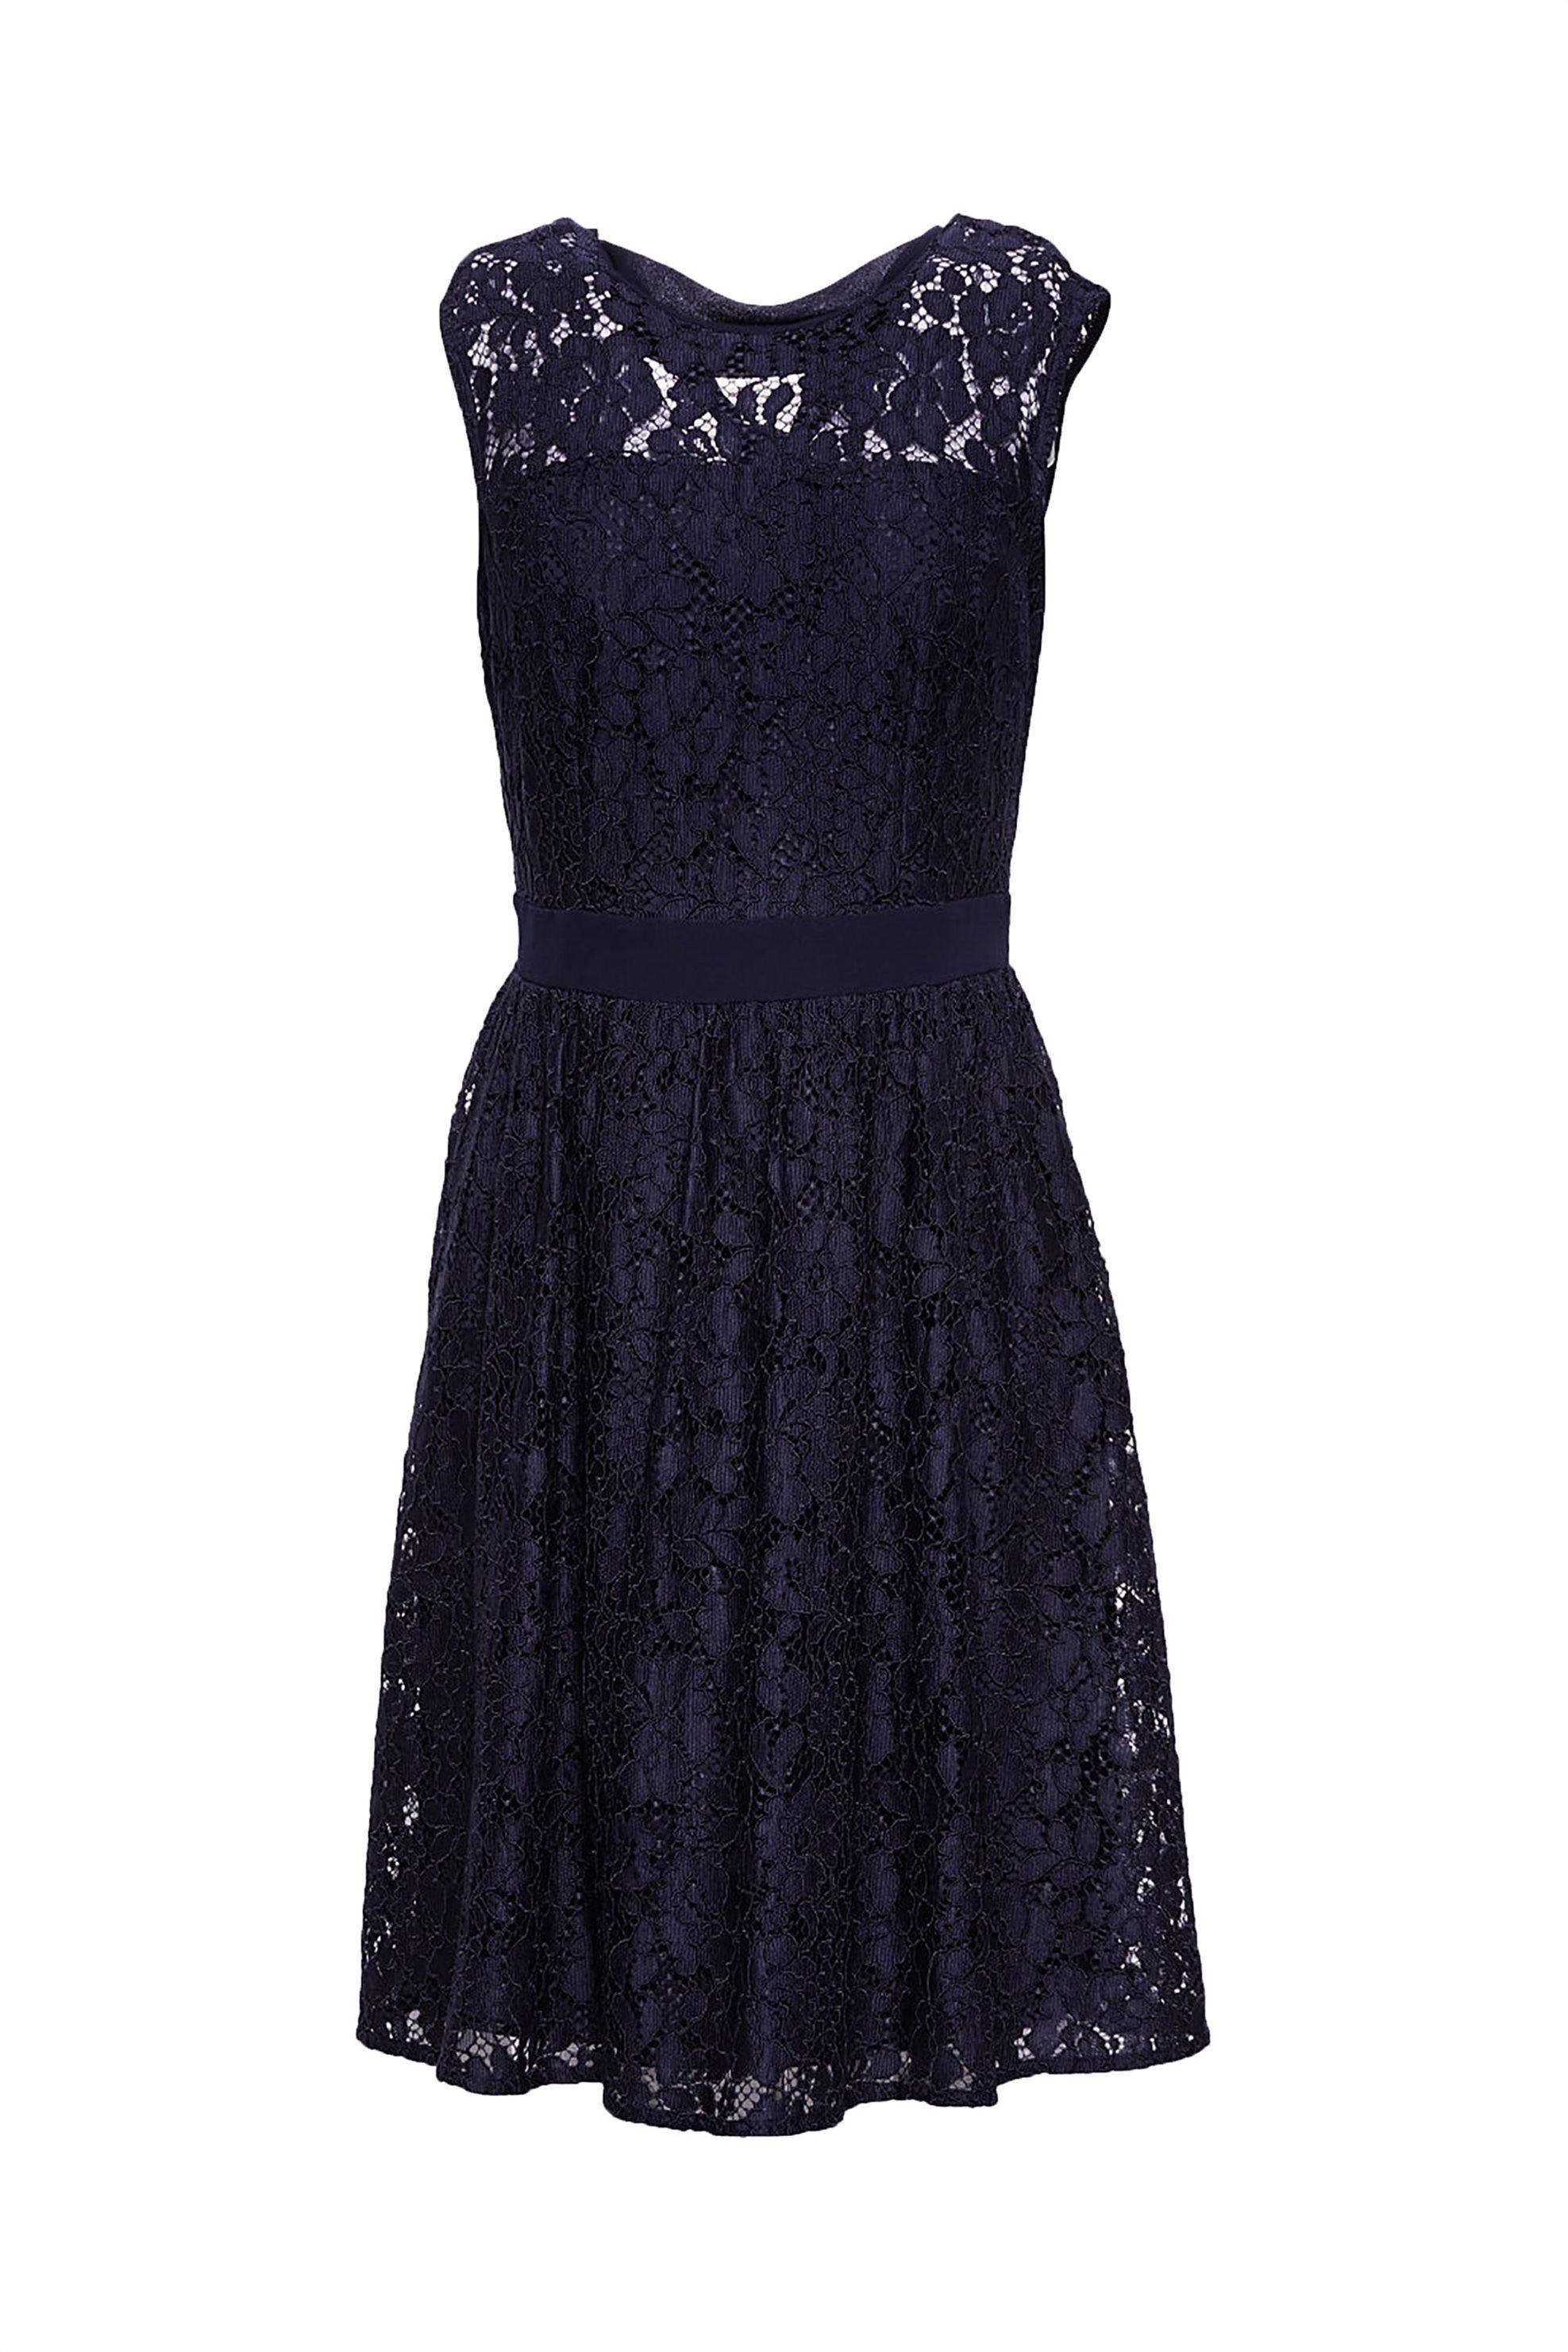 Esprit γυναικείο φόρεμα αμάνικο δαντέλα - 088EO1E016 - Μπλε Σκούρο